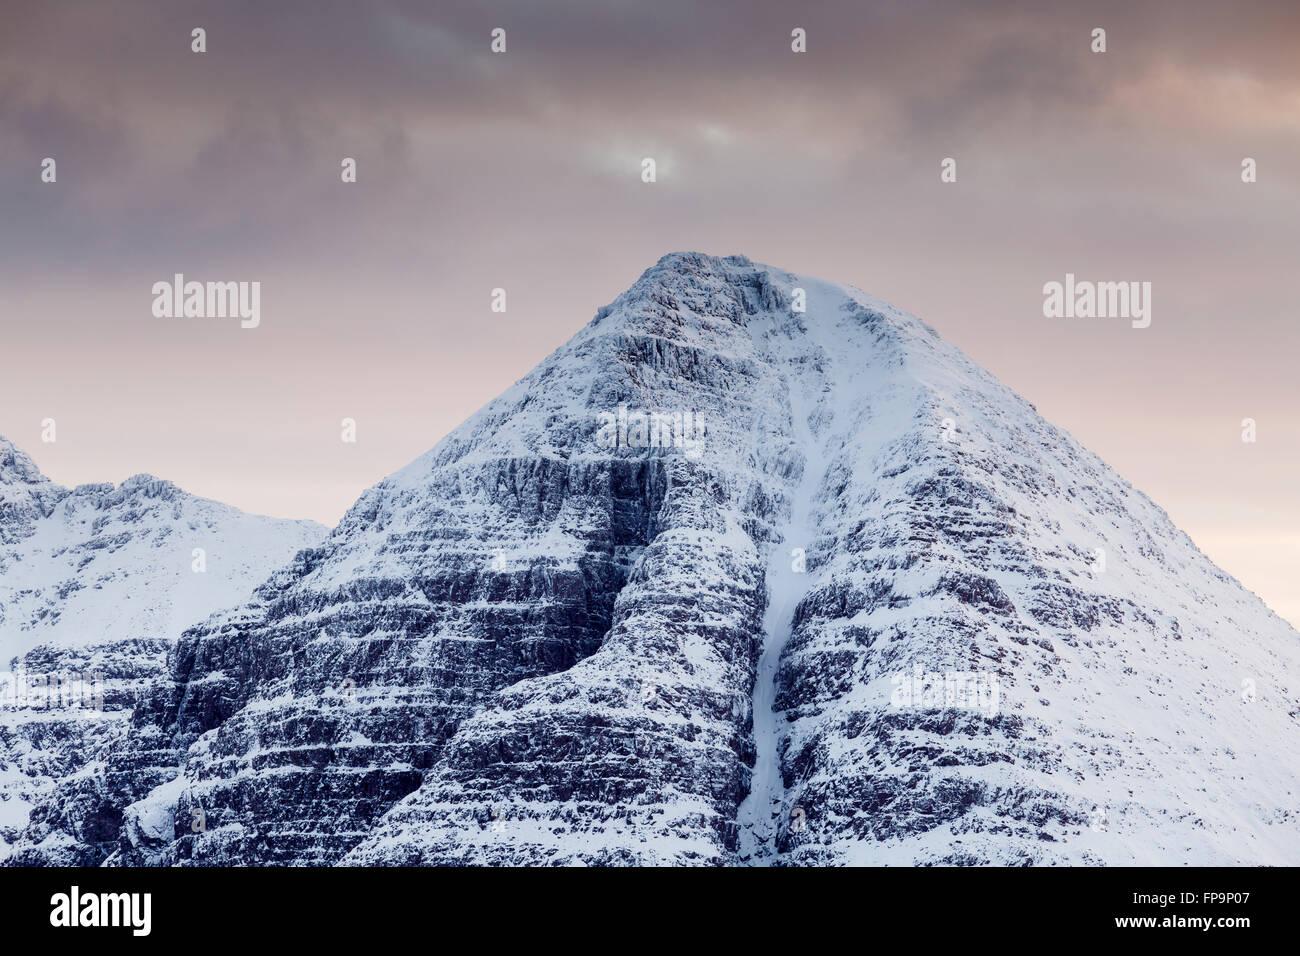 Morrison's gully leading up the steep snowy slopes of Sail Mhor at dusk, Beinn Eighe, Torridon, Scotland - Stock Image